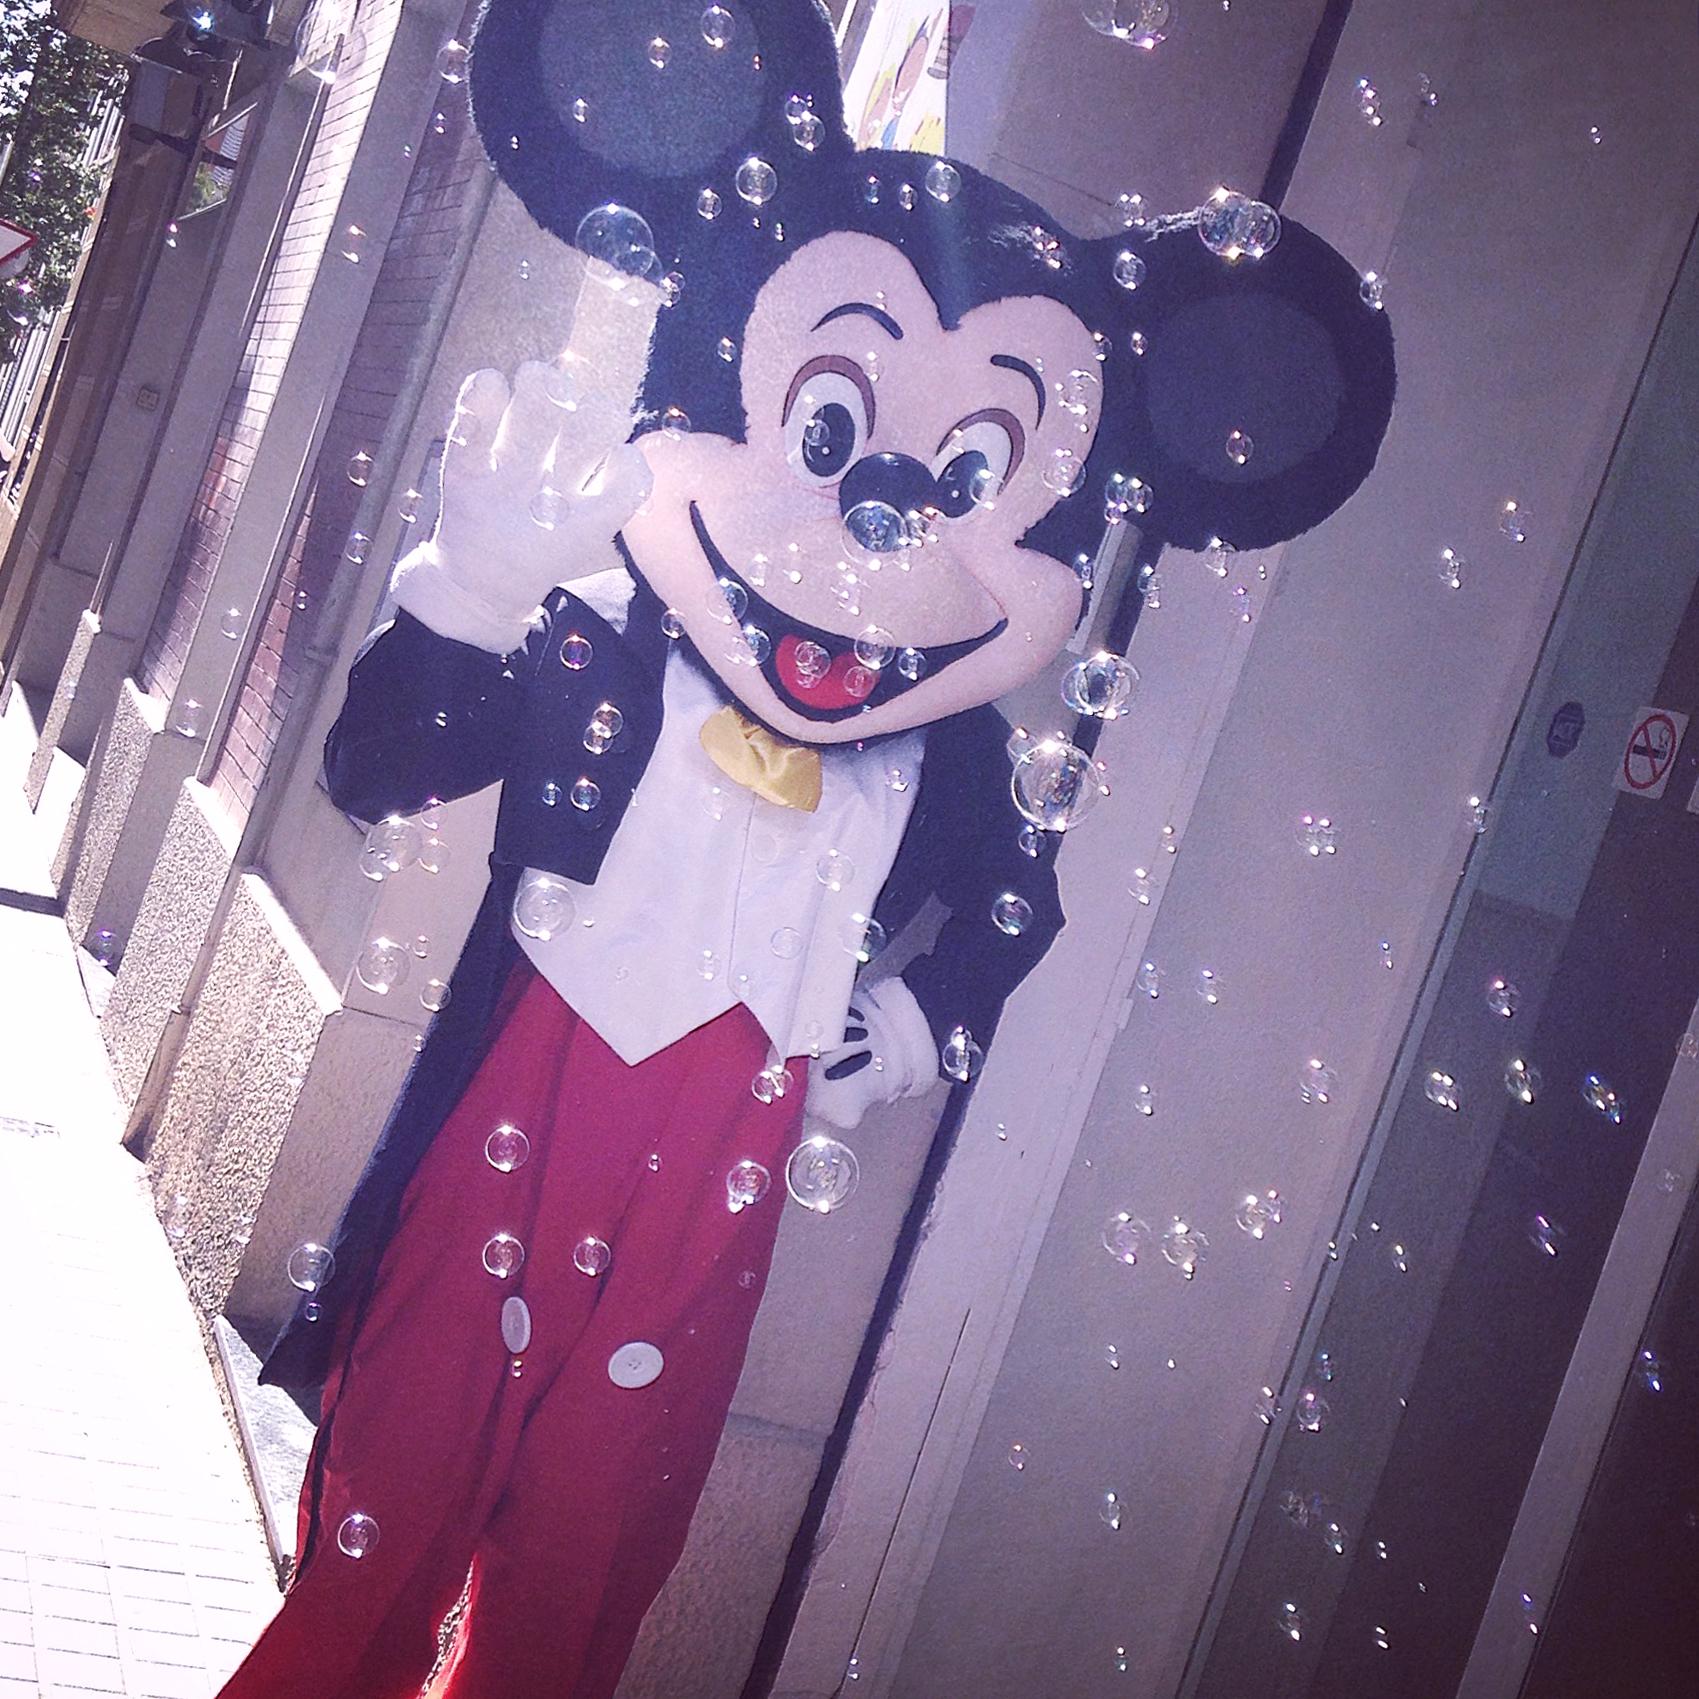 MickeyMouse_BABYfun